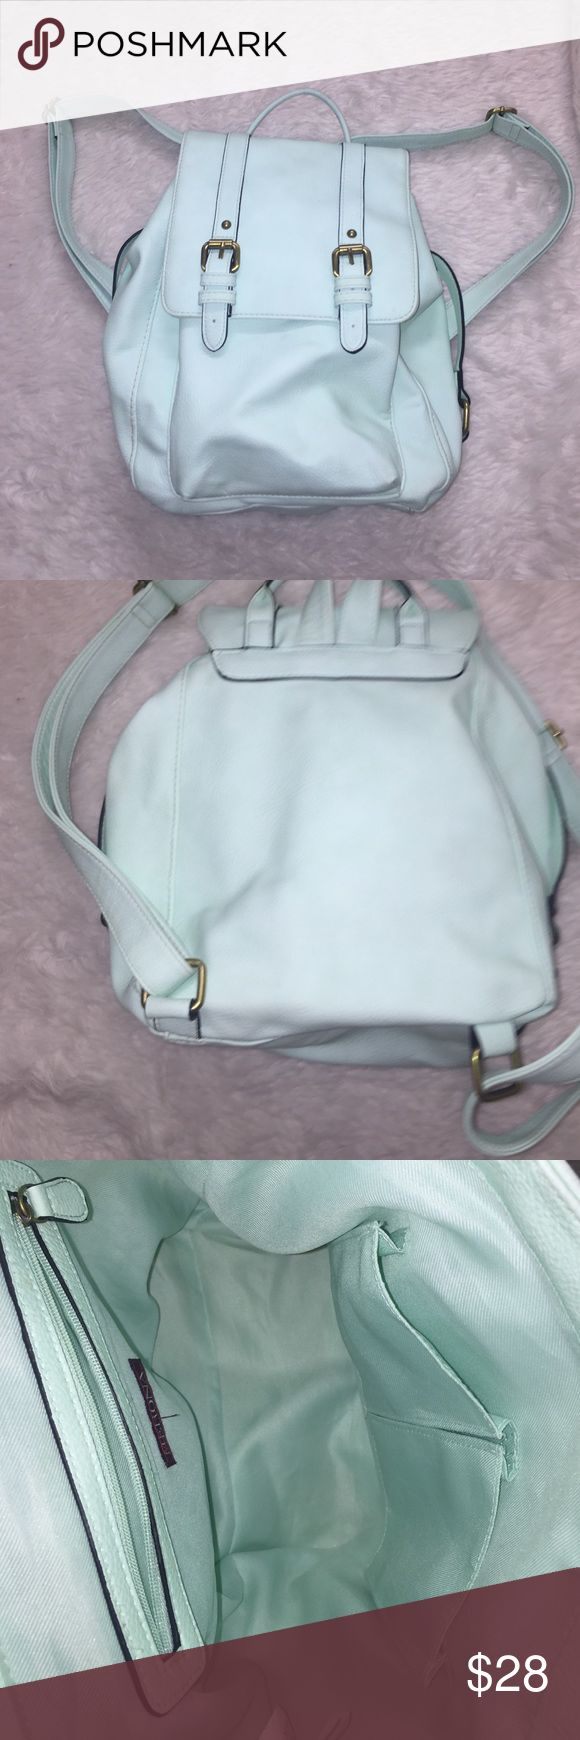 Mint green backpack Stylish mint green back pack sold out everywhere Merona Bags Backpacks